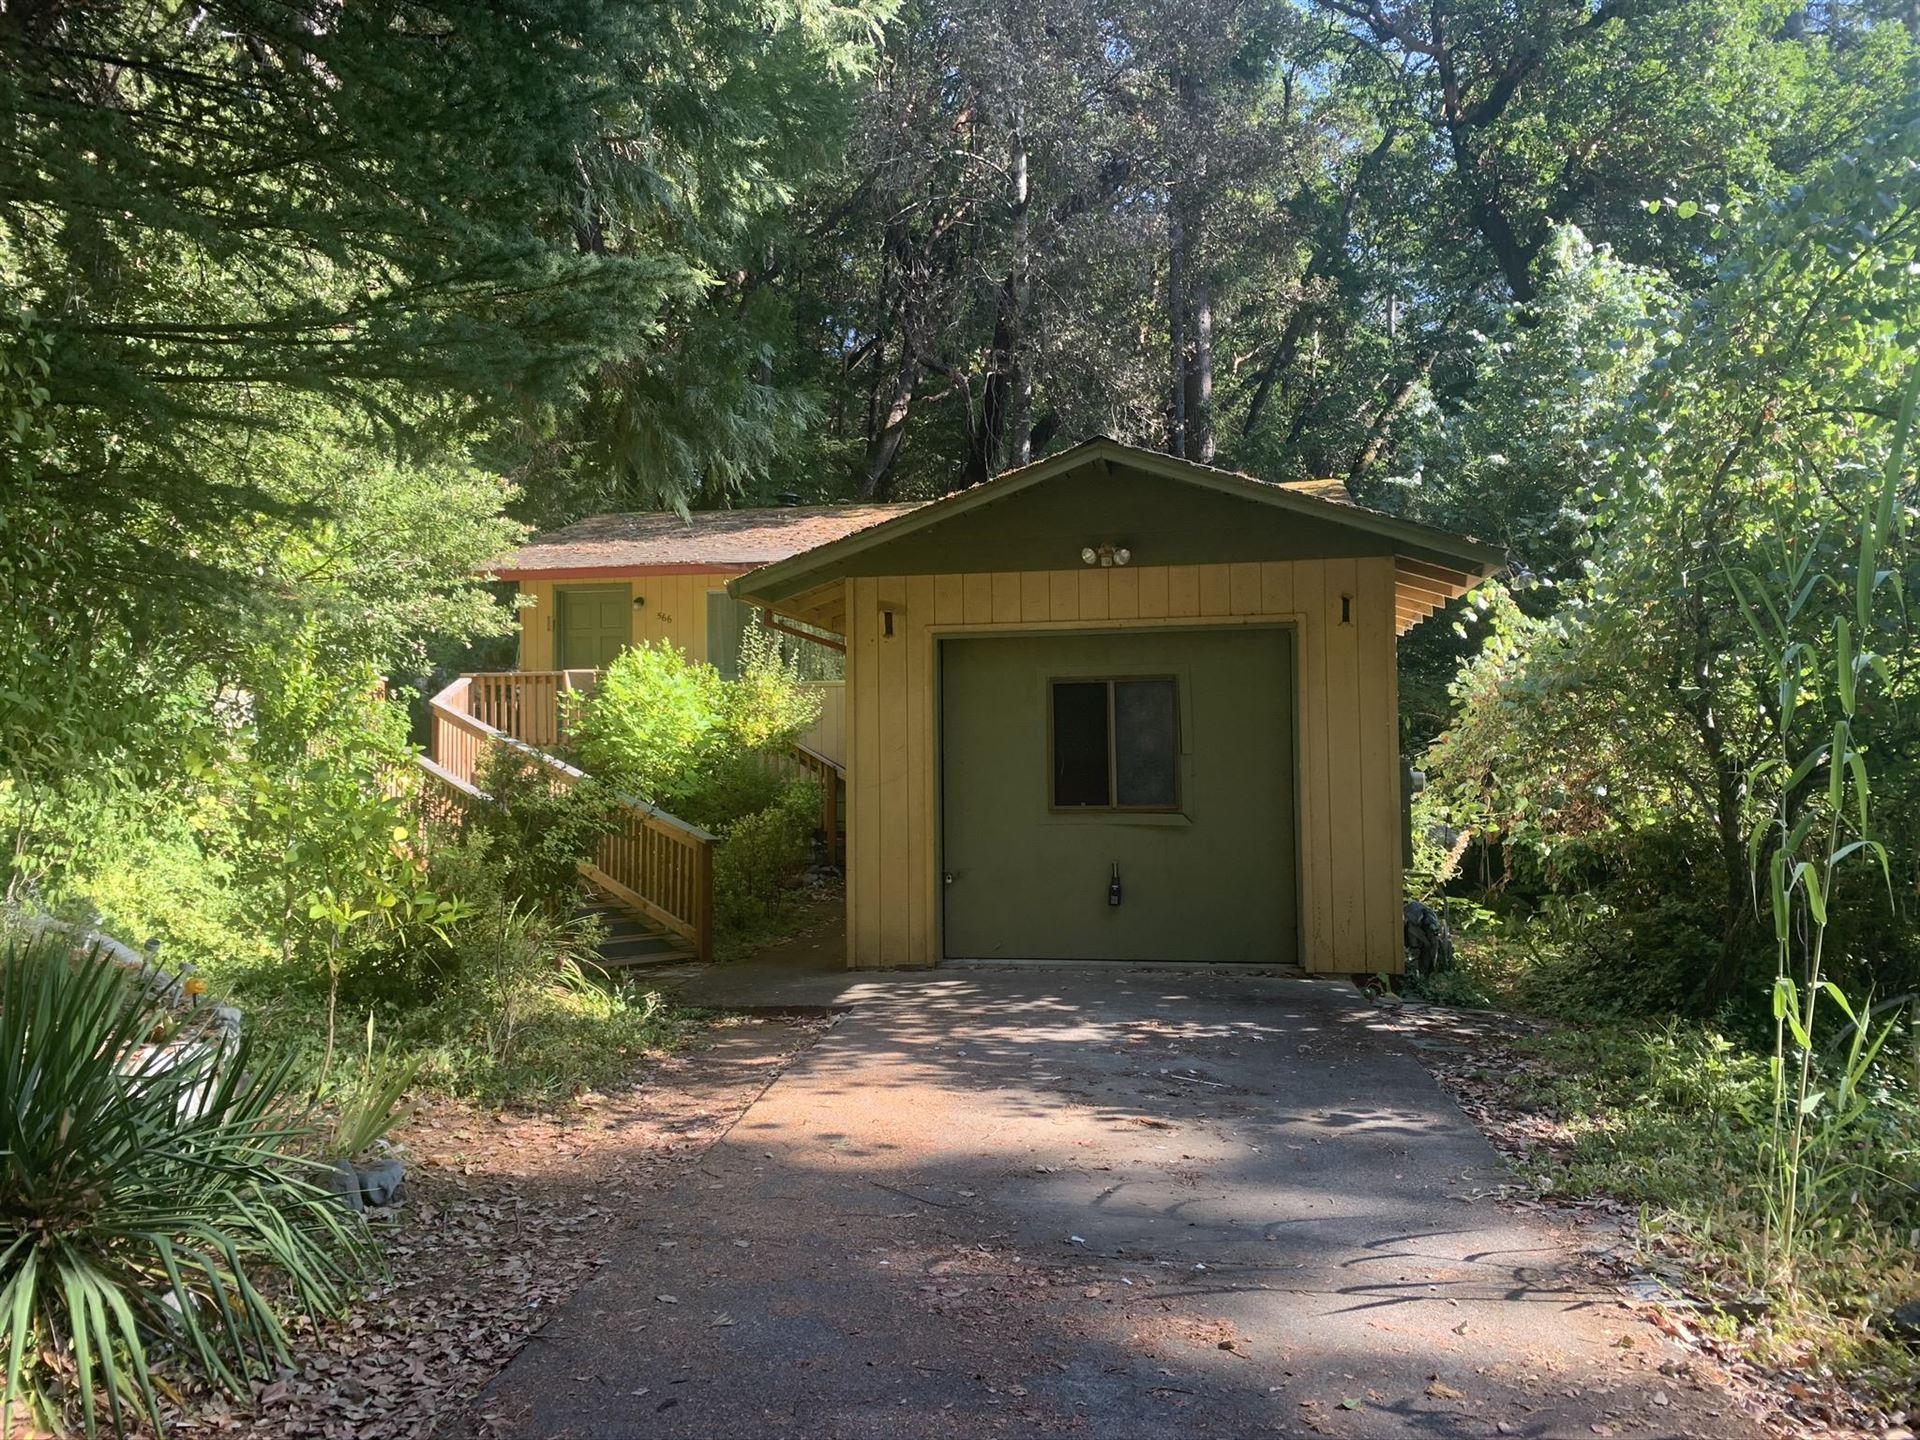 566 Hillcrest Way, Willow Creek, CA 95573 - MLS#: 257047